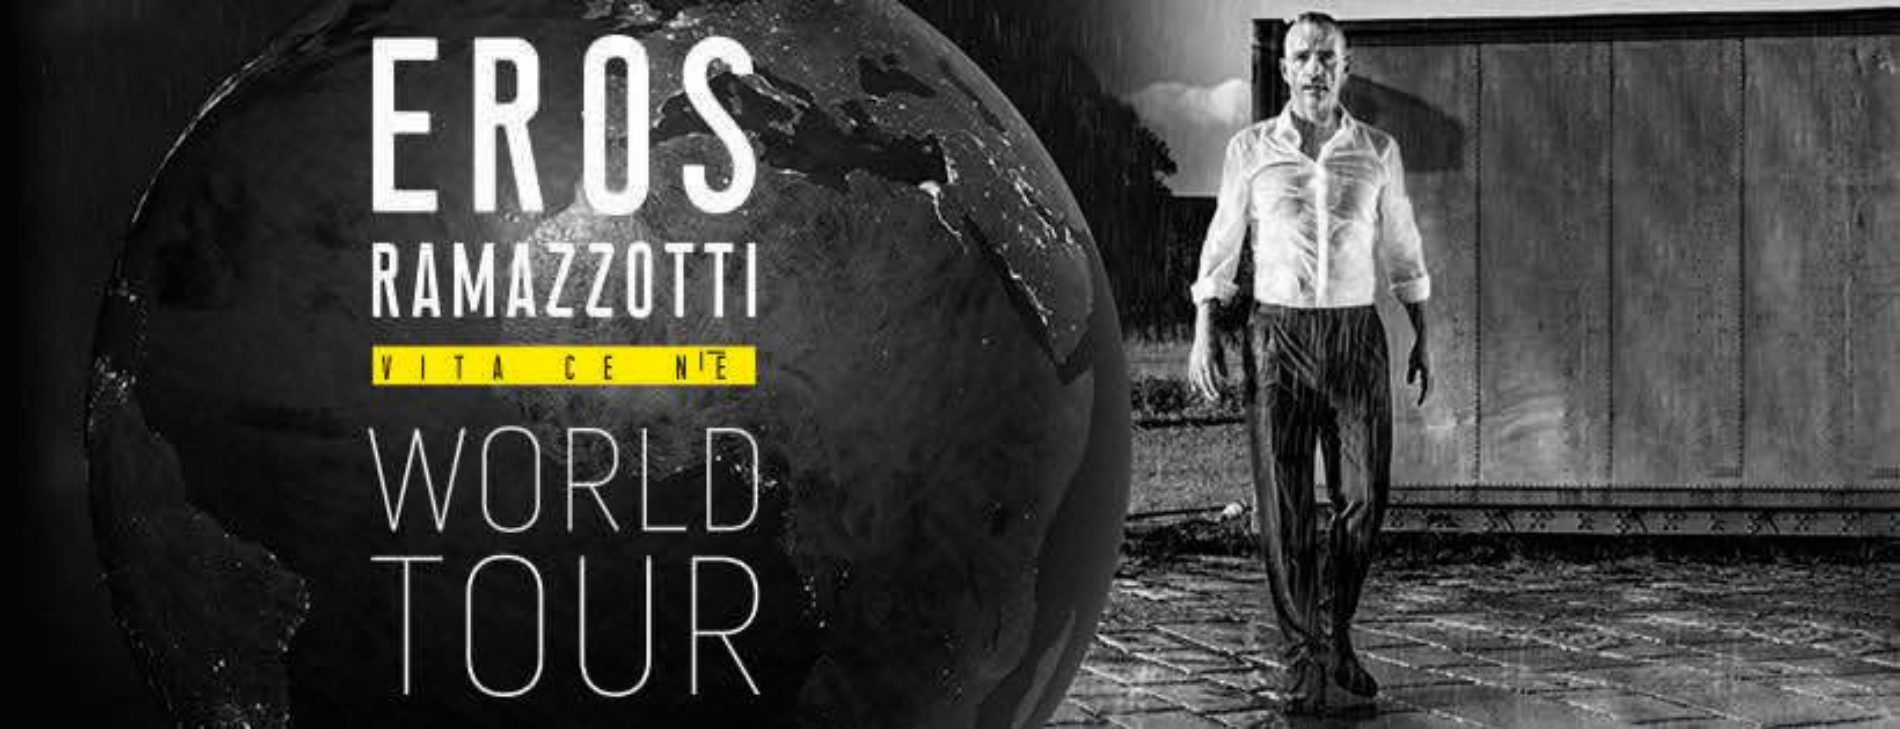 Eros Ramazzotti kommt auf Welttour 2019